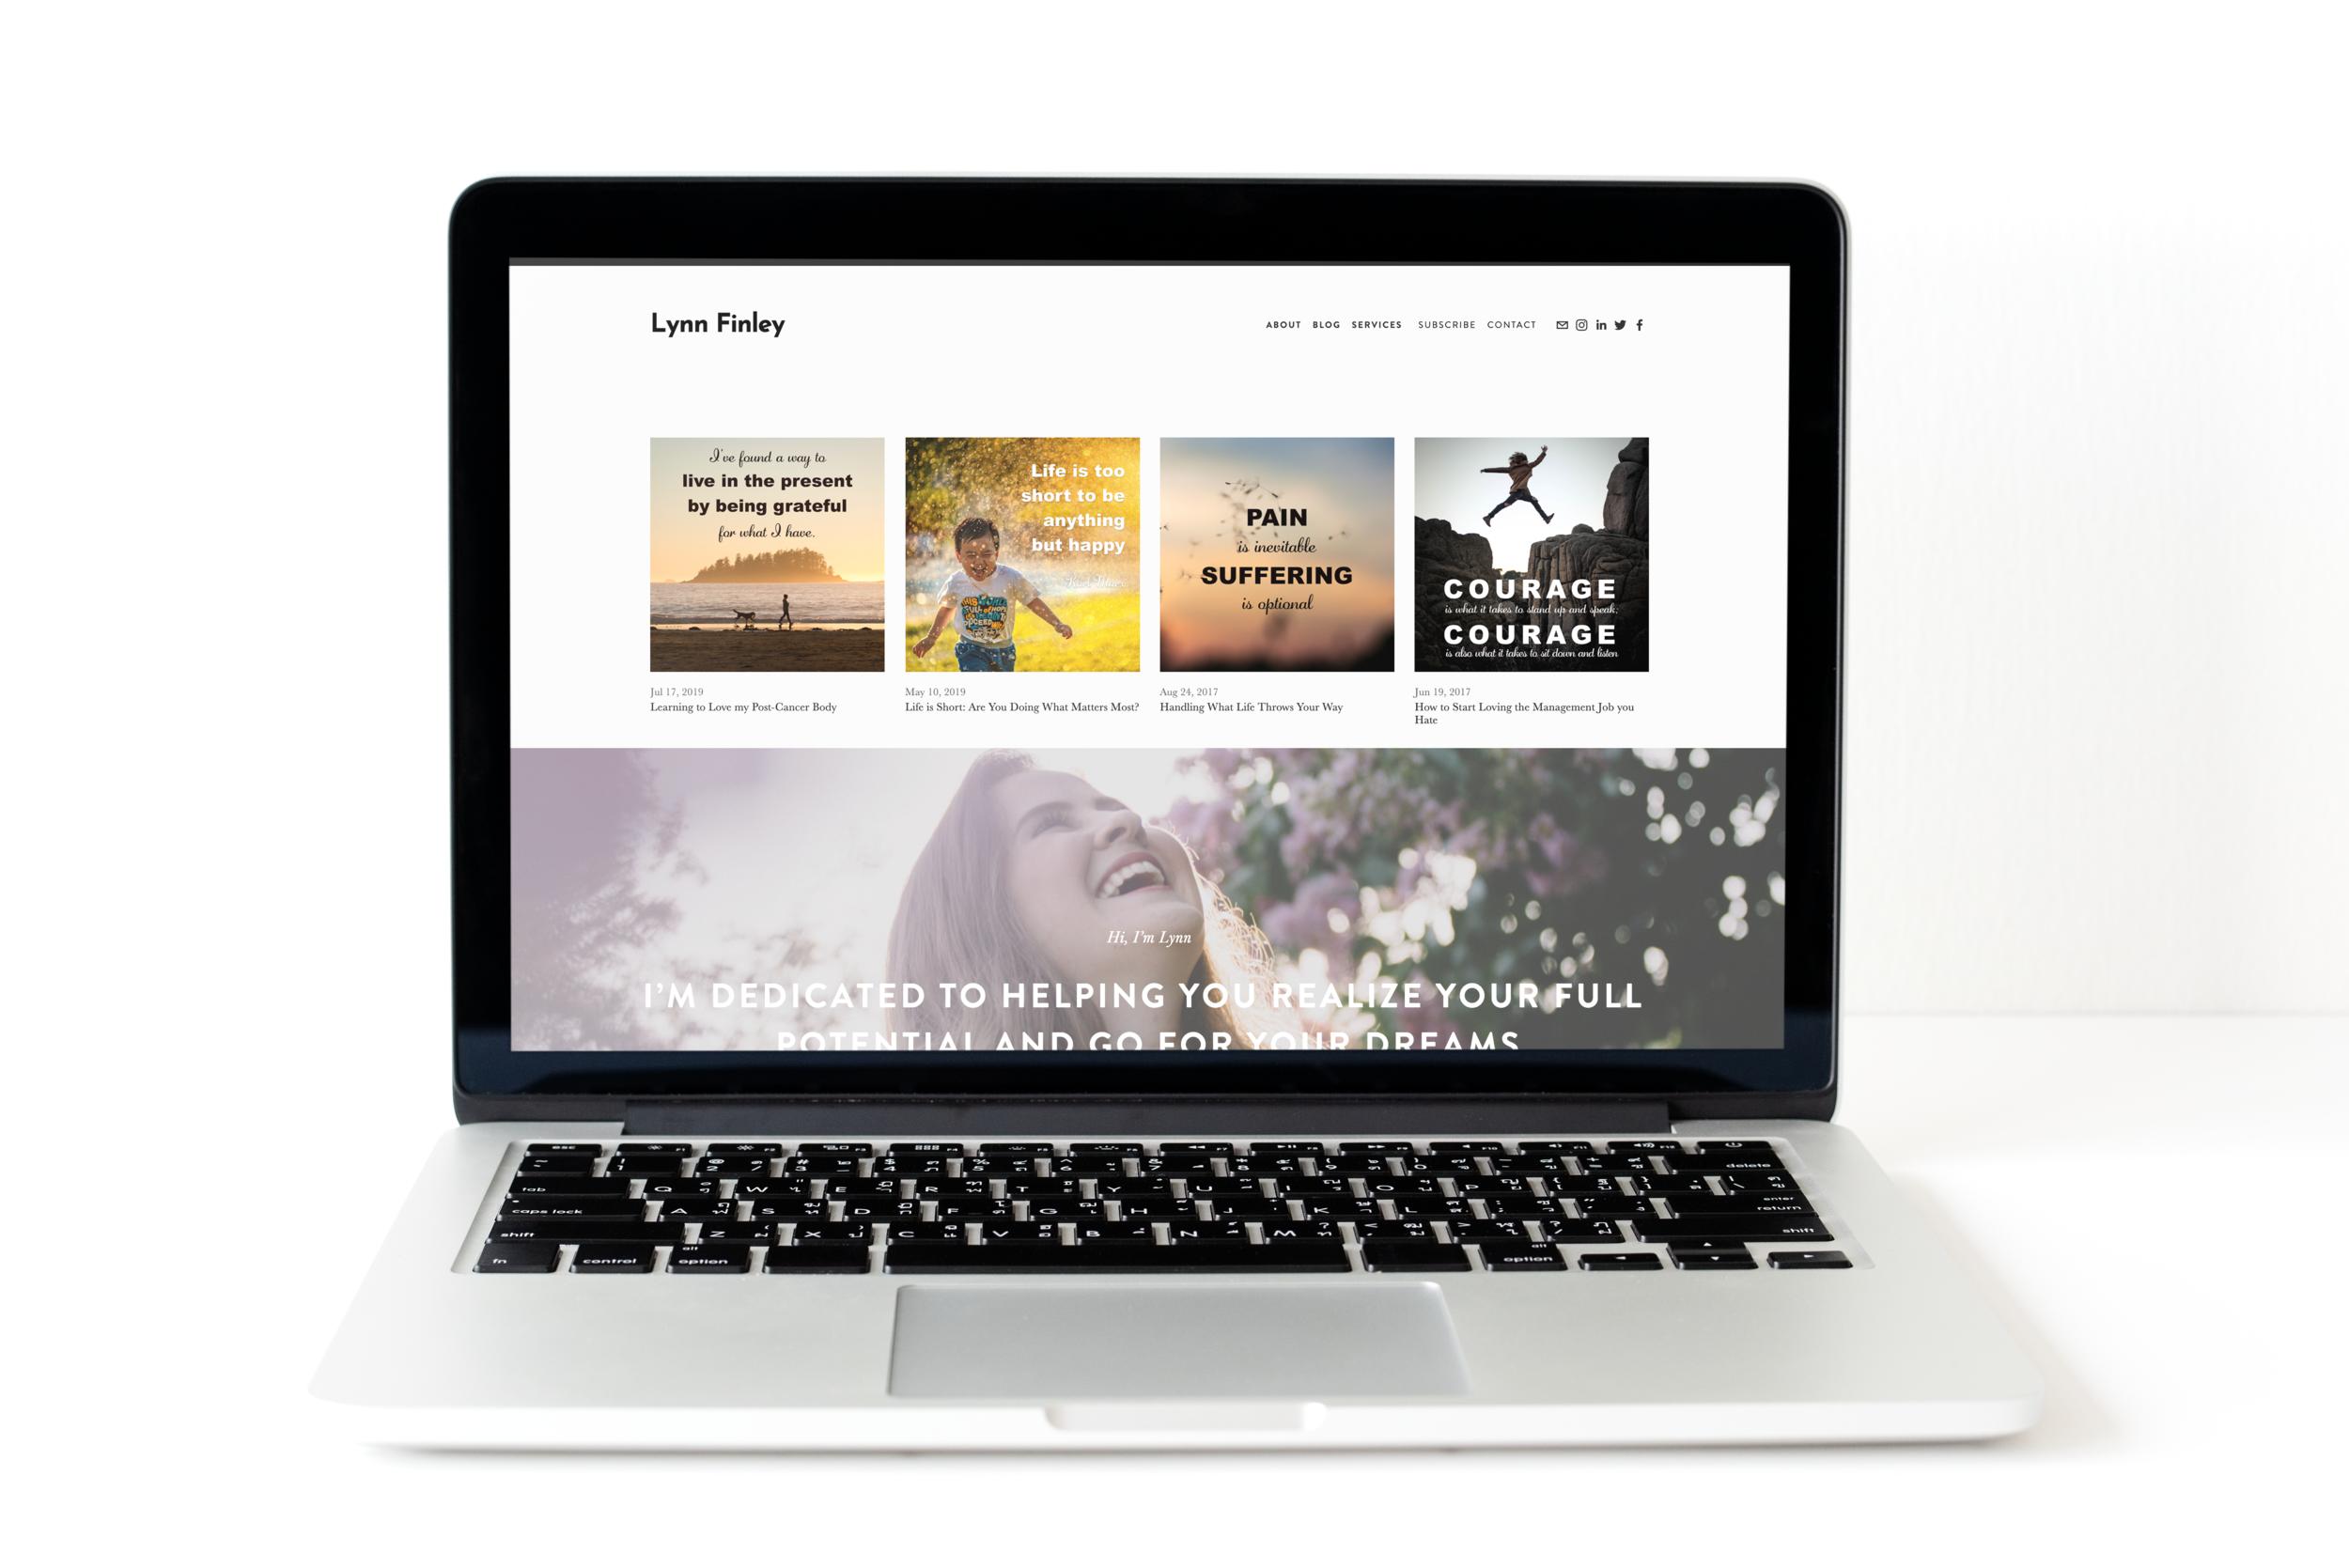 Lynn Finley Coaching - Website design, branding and graphic design